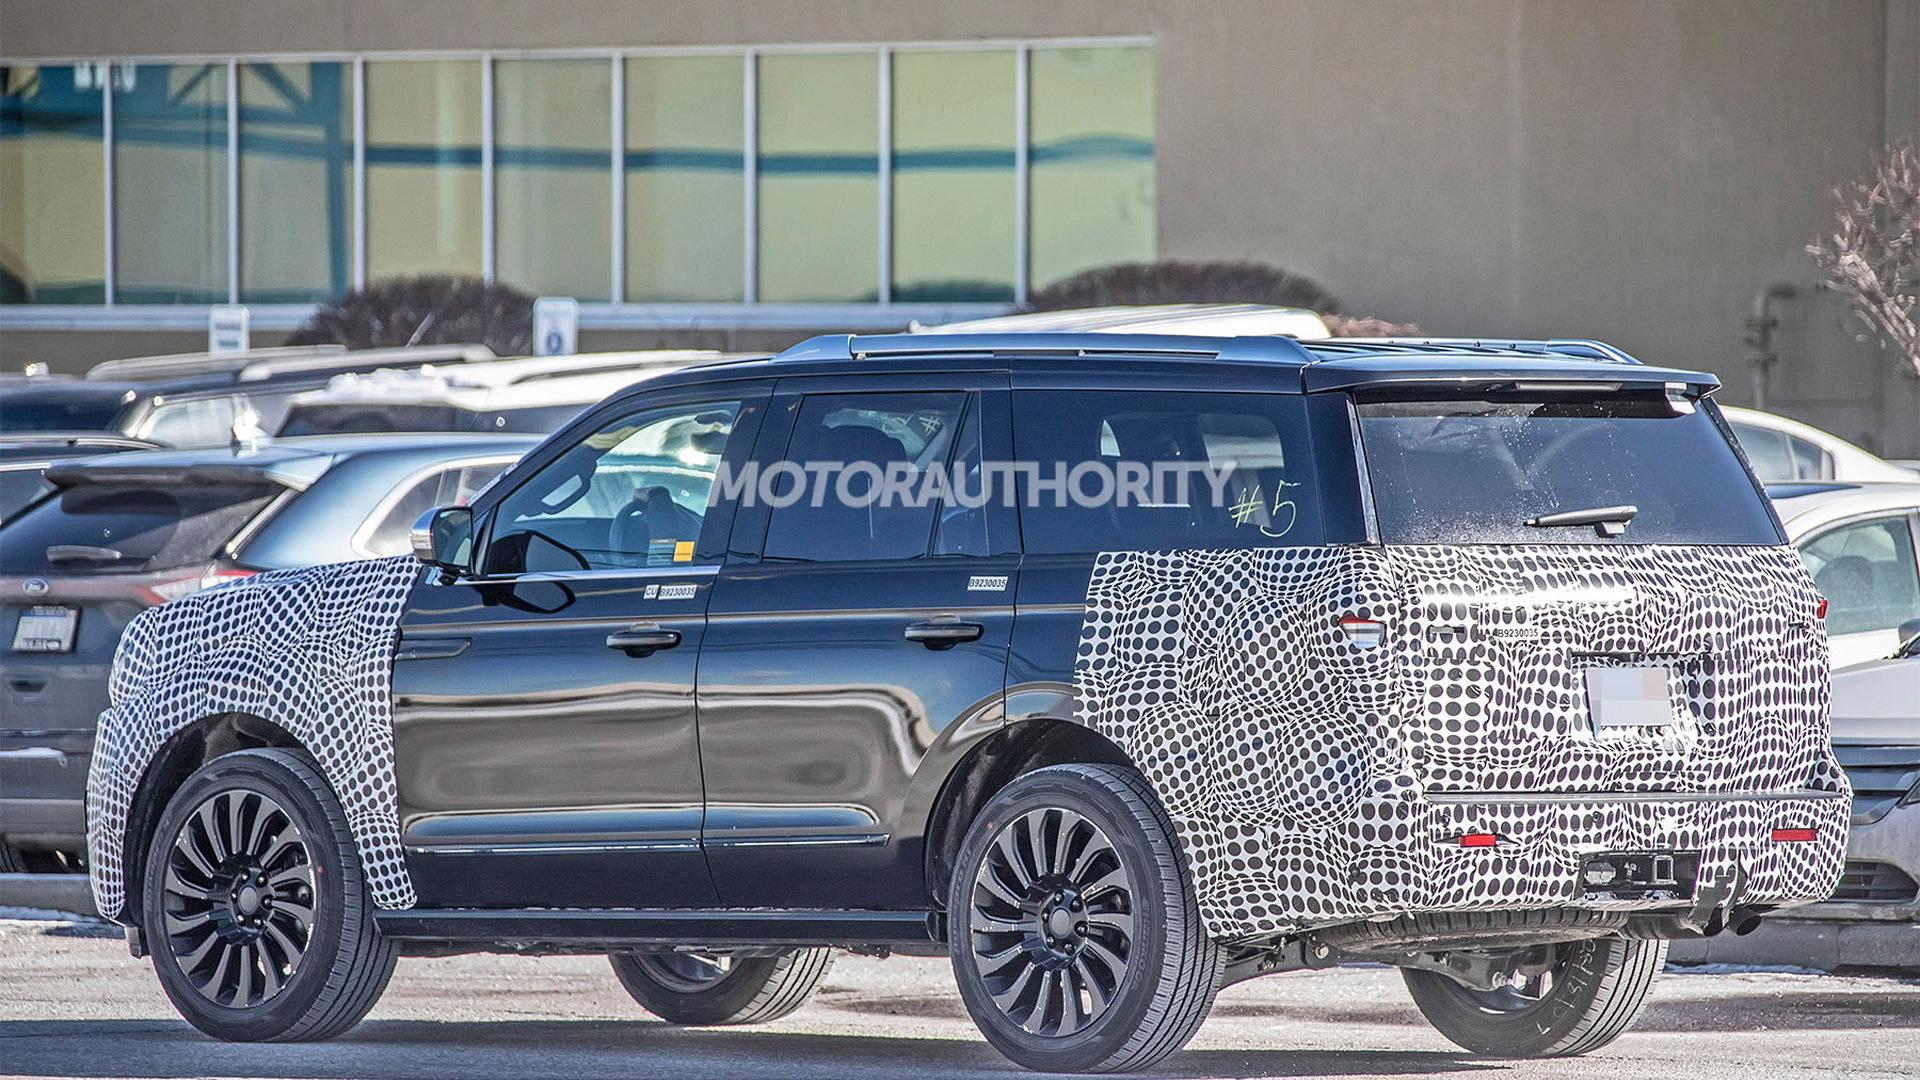 2022 Lincoln Navigator facelift spy shots - Photo credit:S. Baldauf/SB-Medien